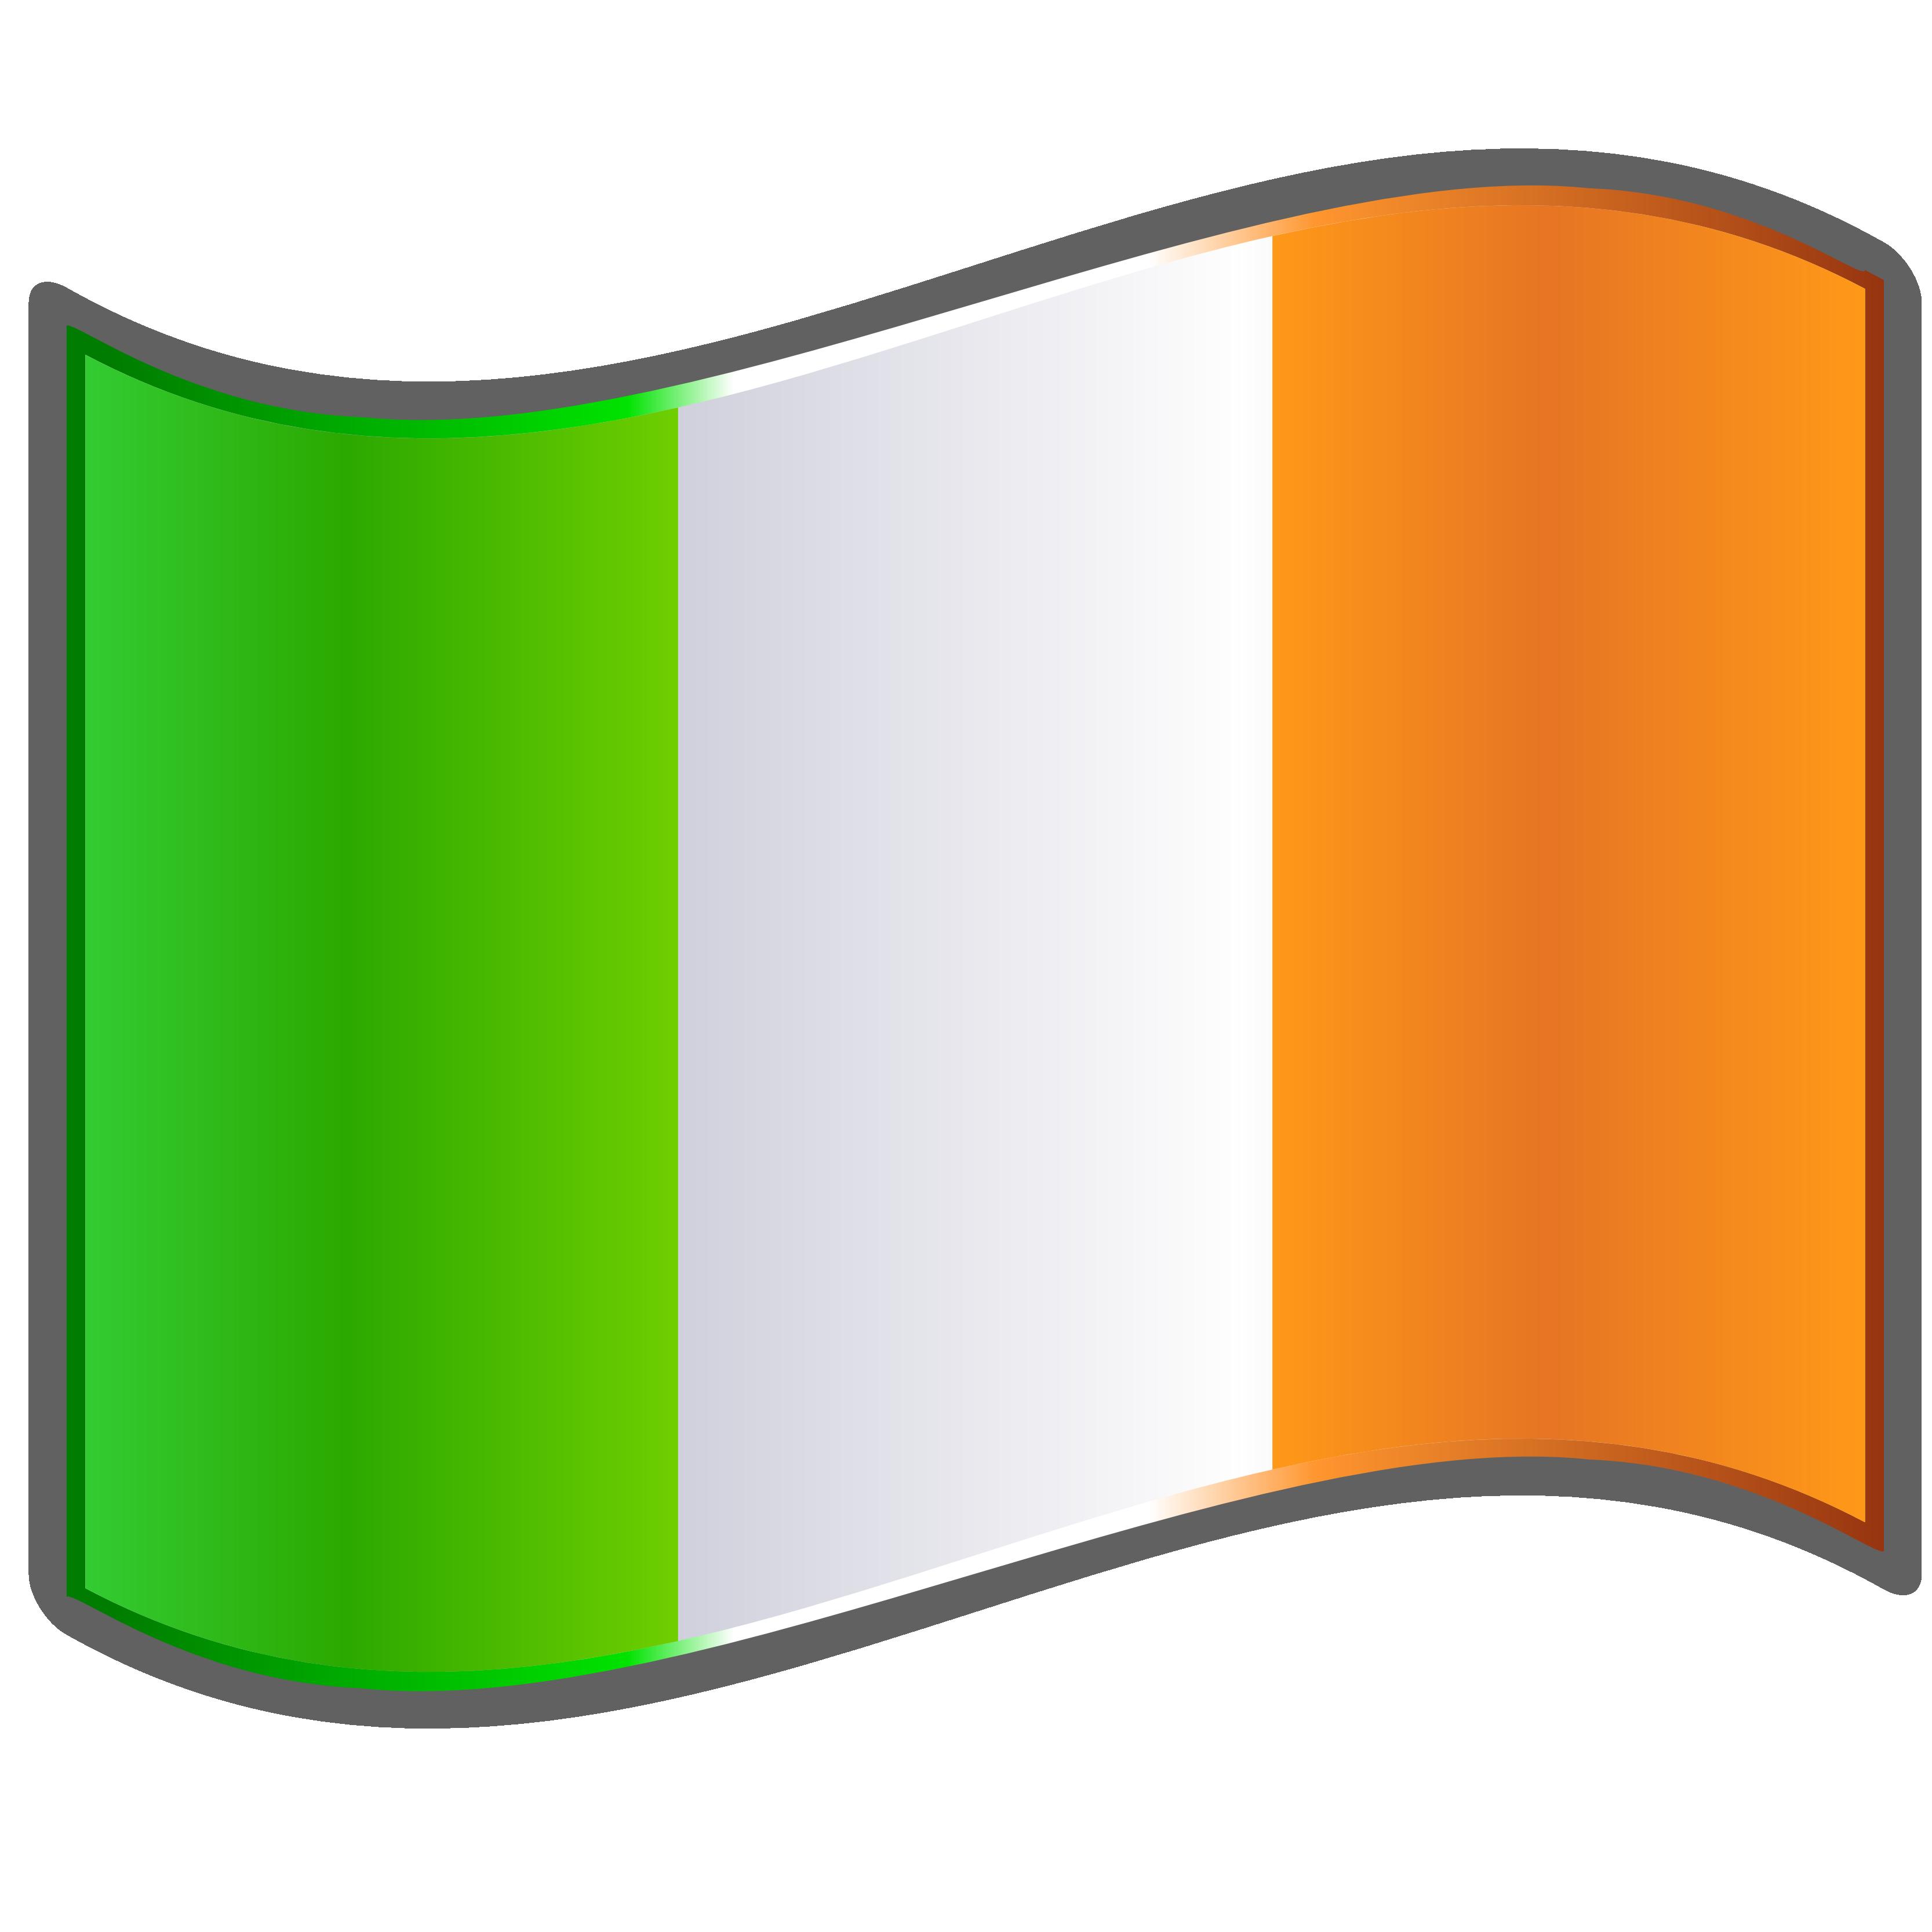 High Resolution Wallpaper | Flag Of Ireland 3333x3333 px